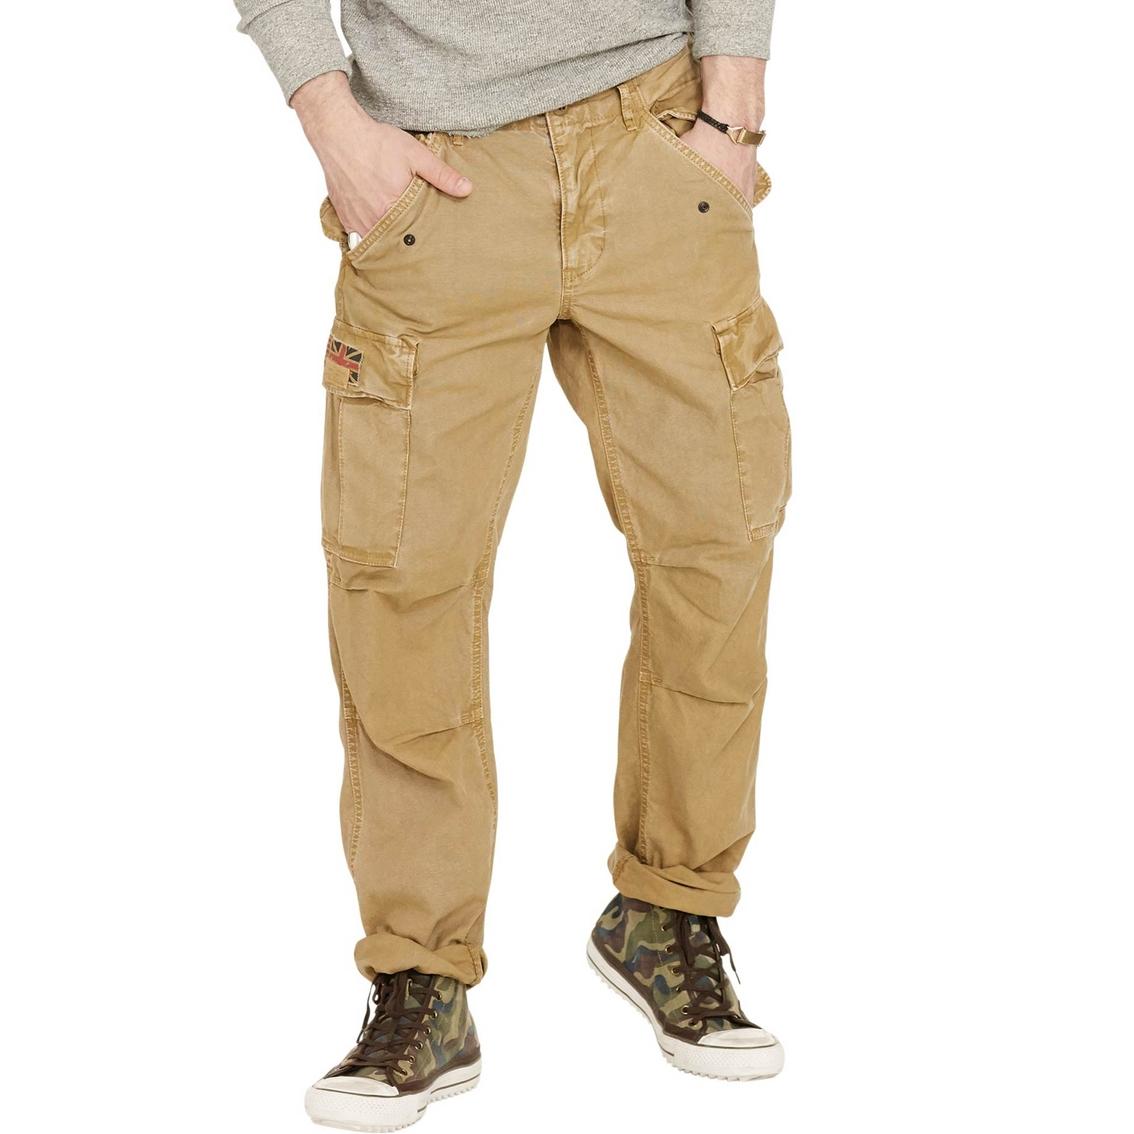 6271d4f83d Denim & Supply Ralph Lauren Slim Fit Field Cargo Pants | Pants | Apparel |  Shop The Exchange